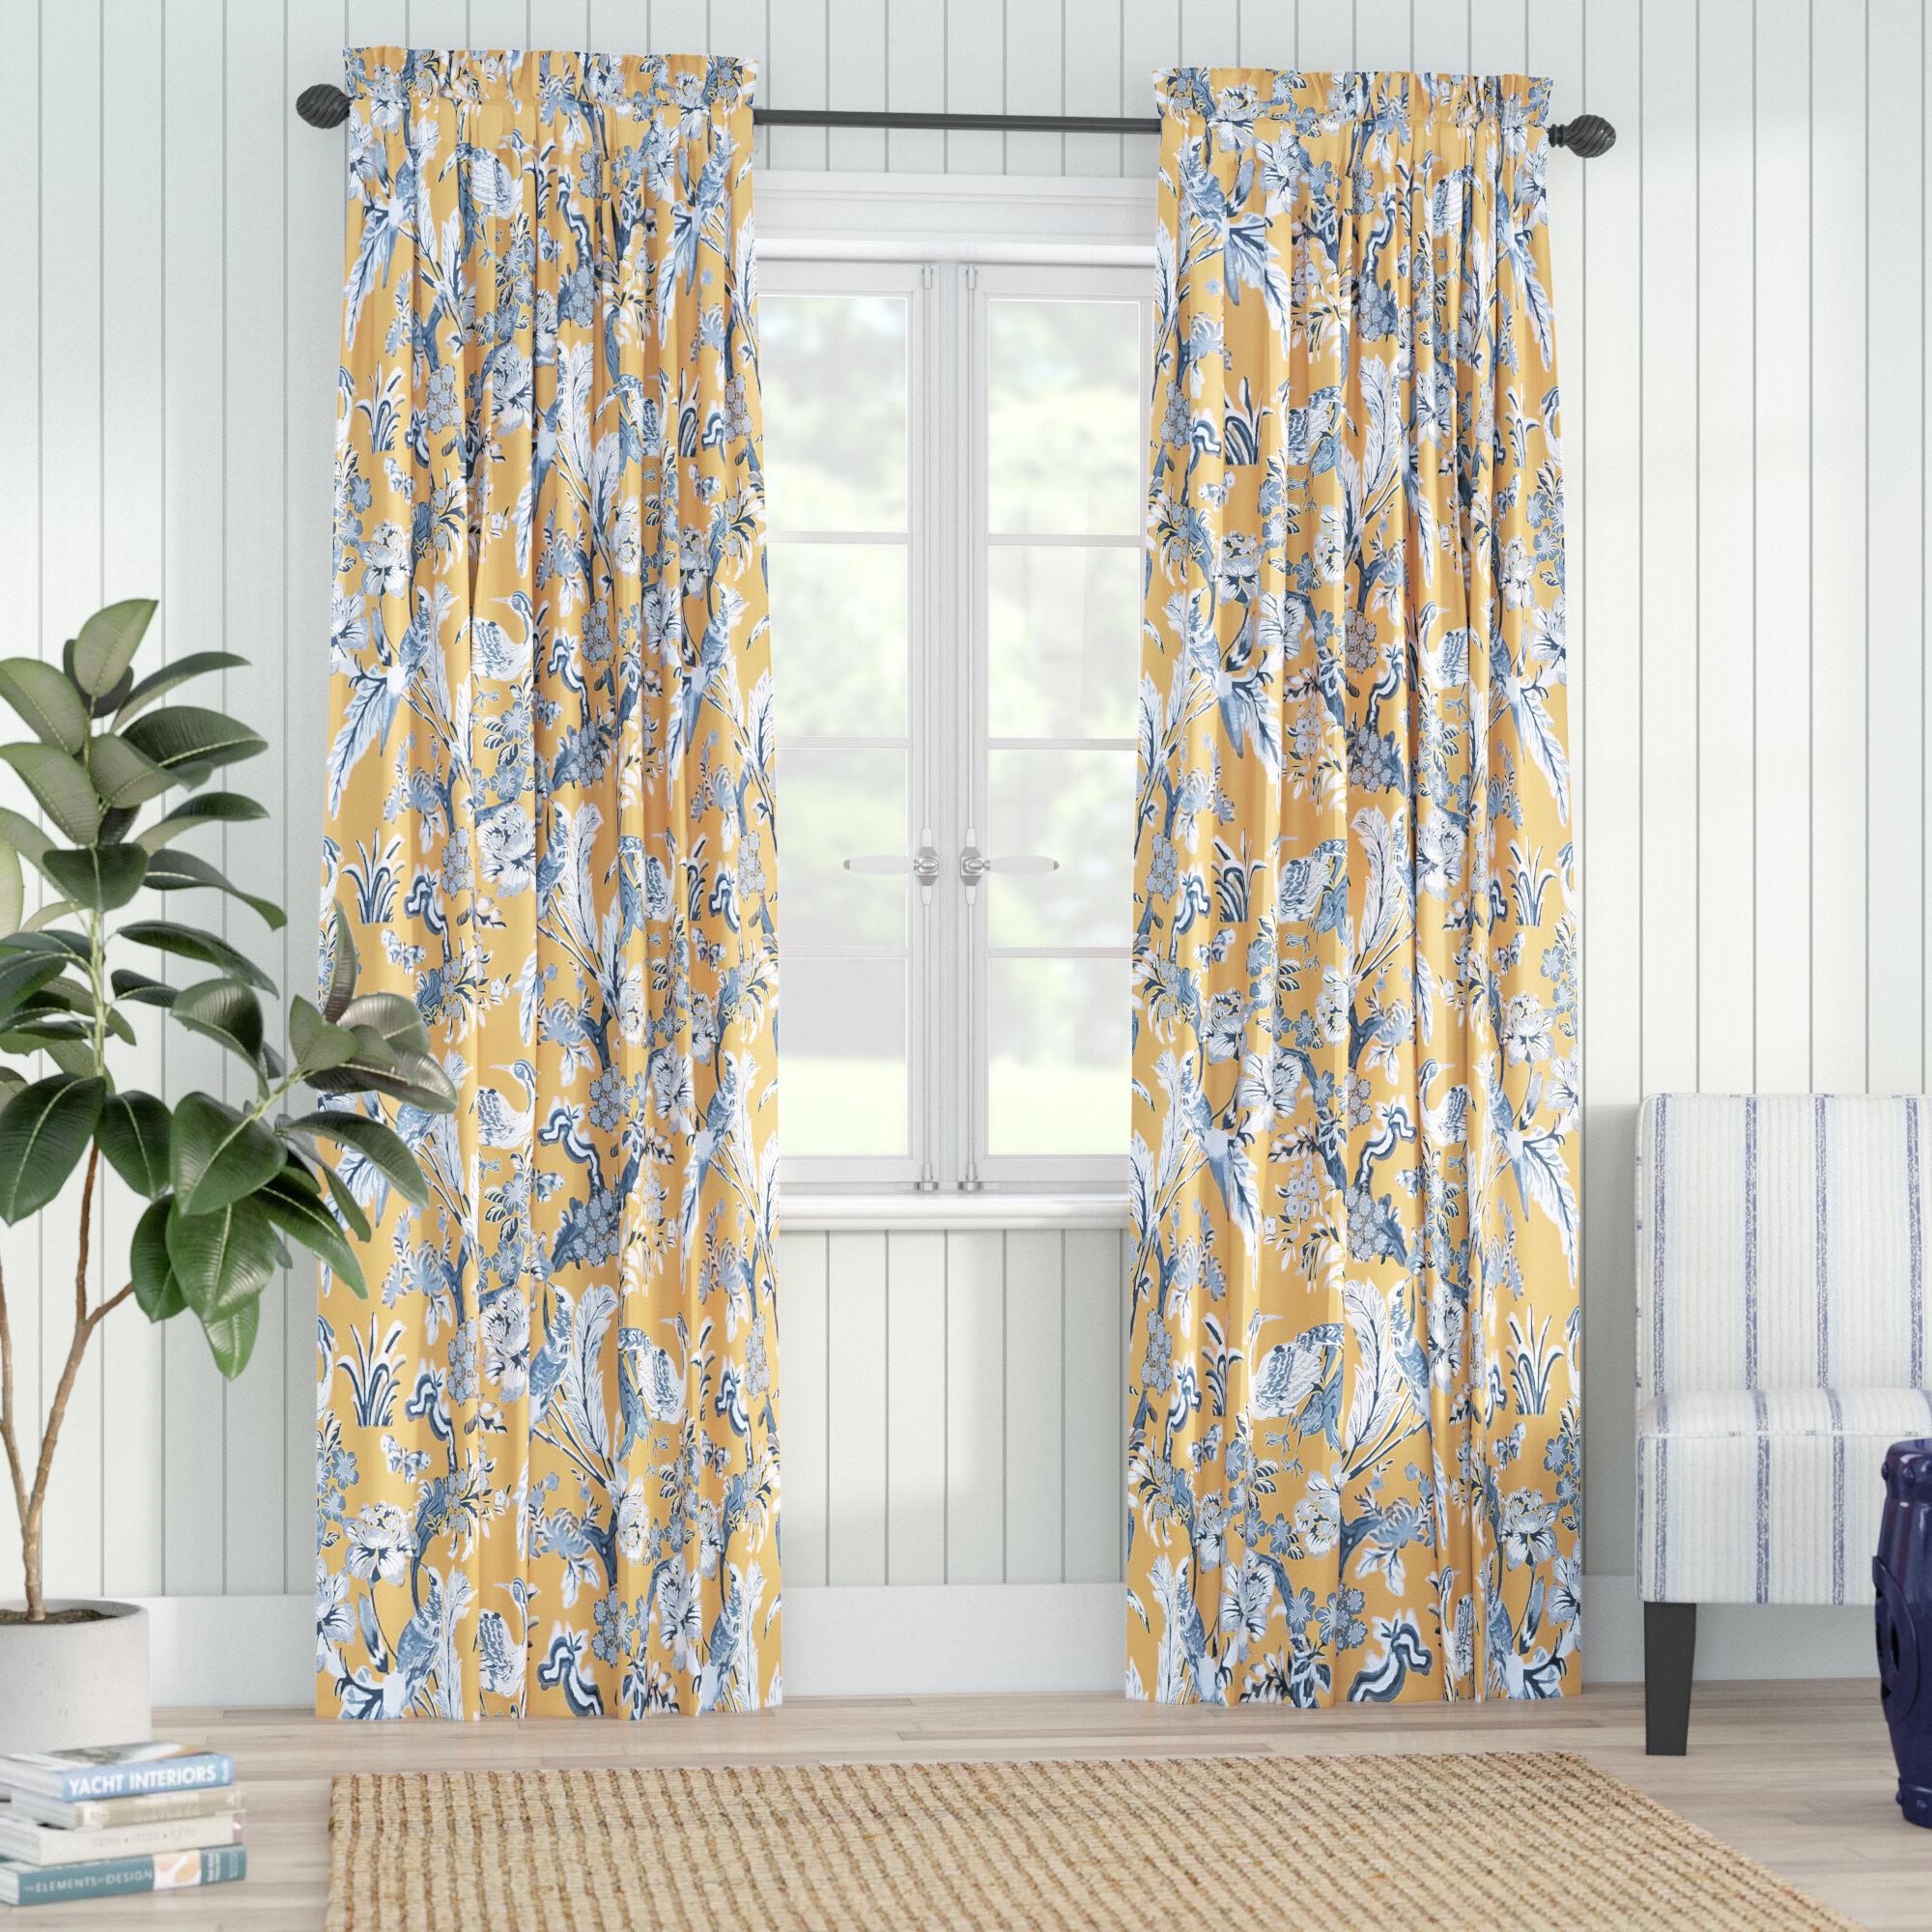 Bay Isle Home Panagia Floral Room Darkening Thermal Rod Pocket Curtain Panels Reviews Wayfair